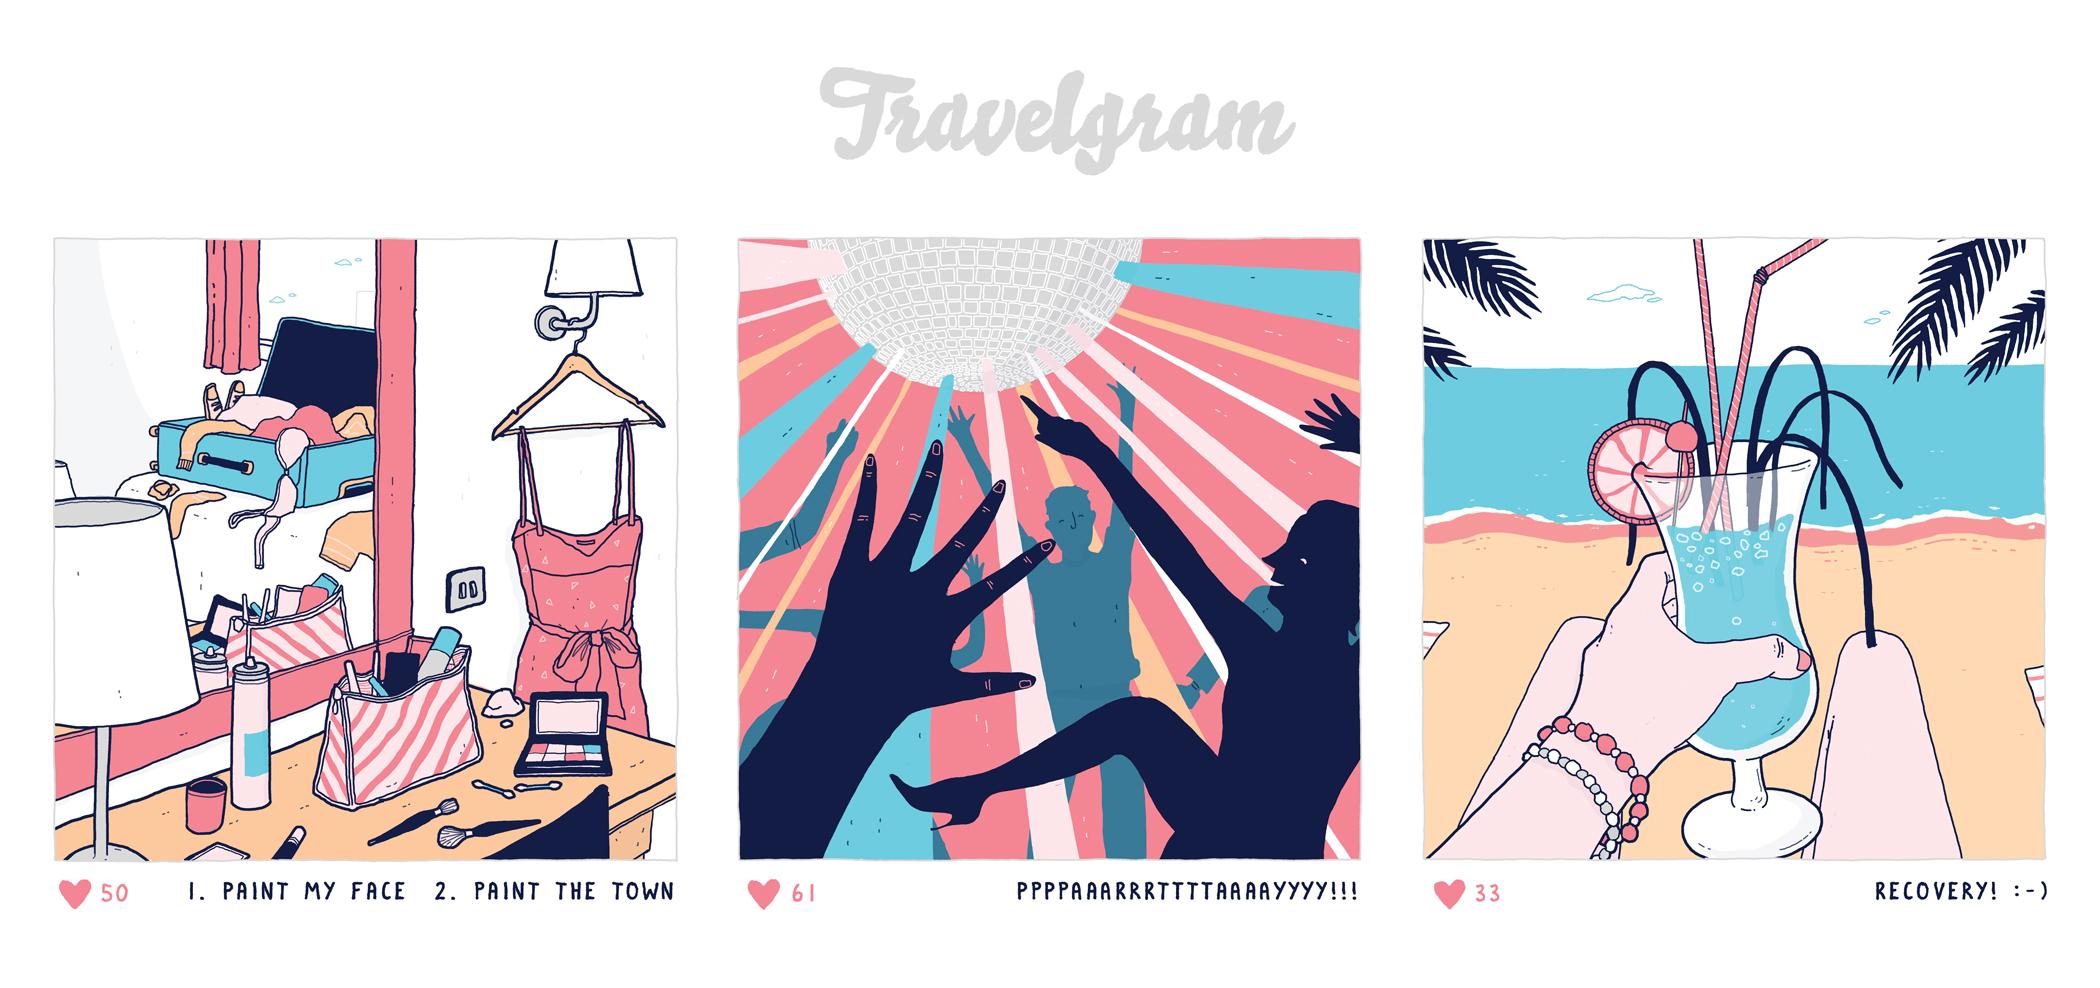 travelgram-web-03-partying.jpg